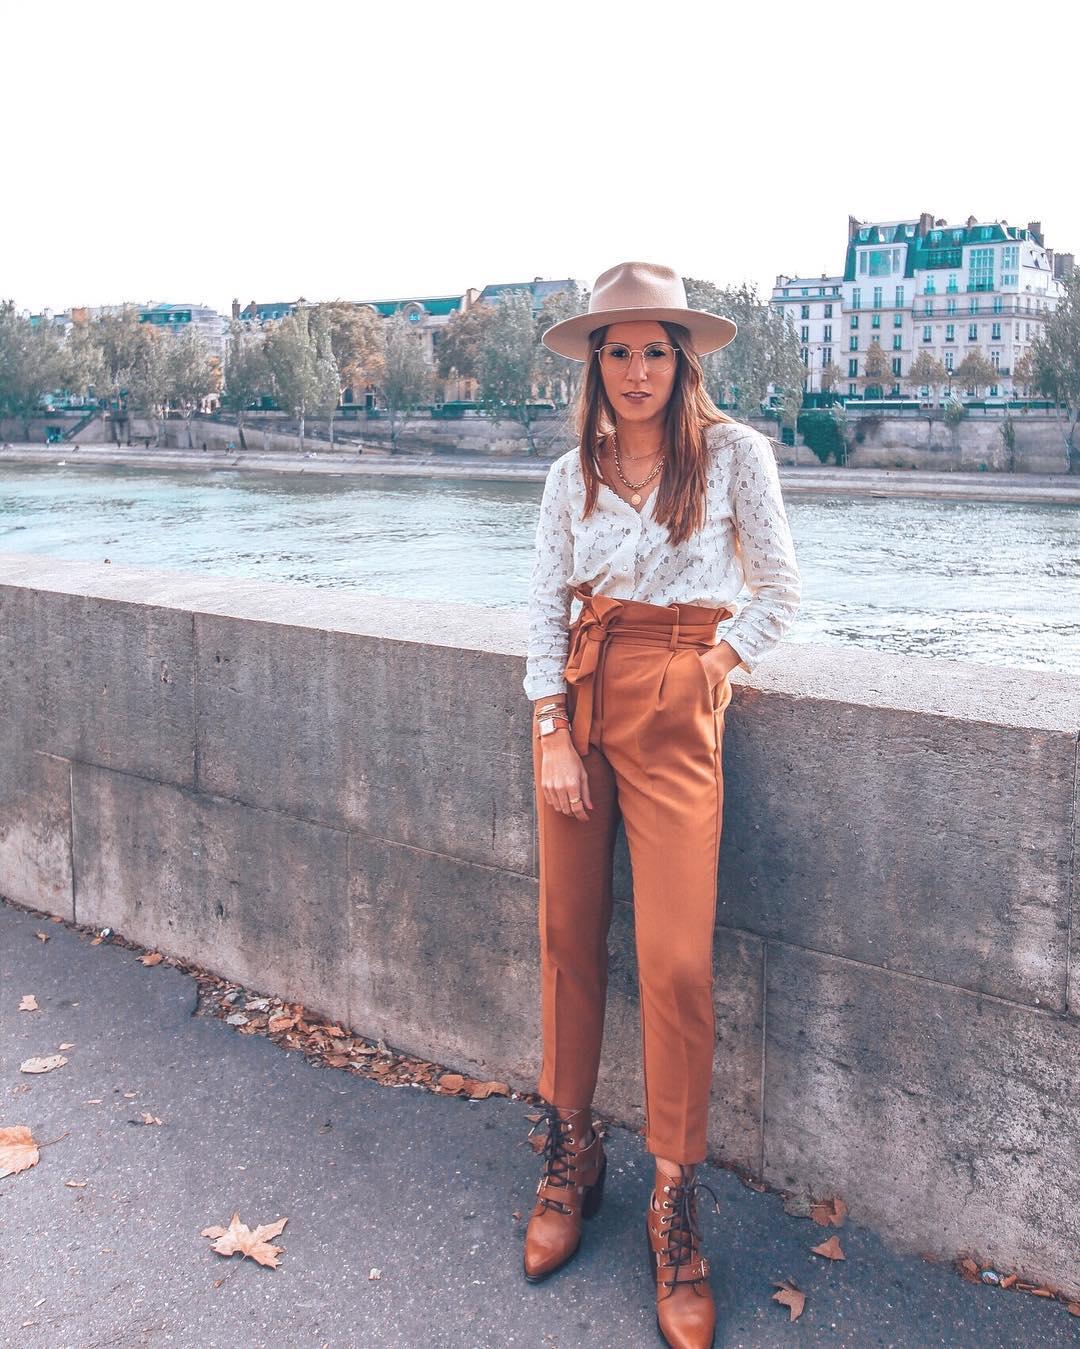 pantalon caramel de Les Bourgeoises sur perrineontheroad